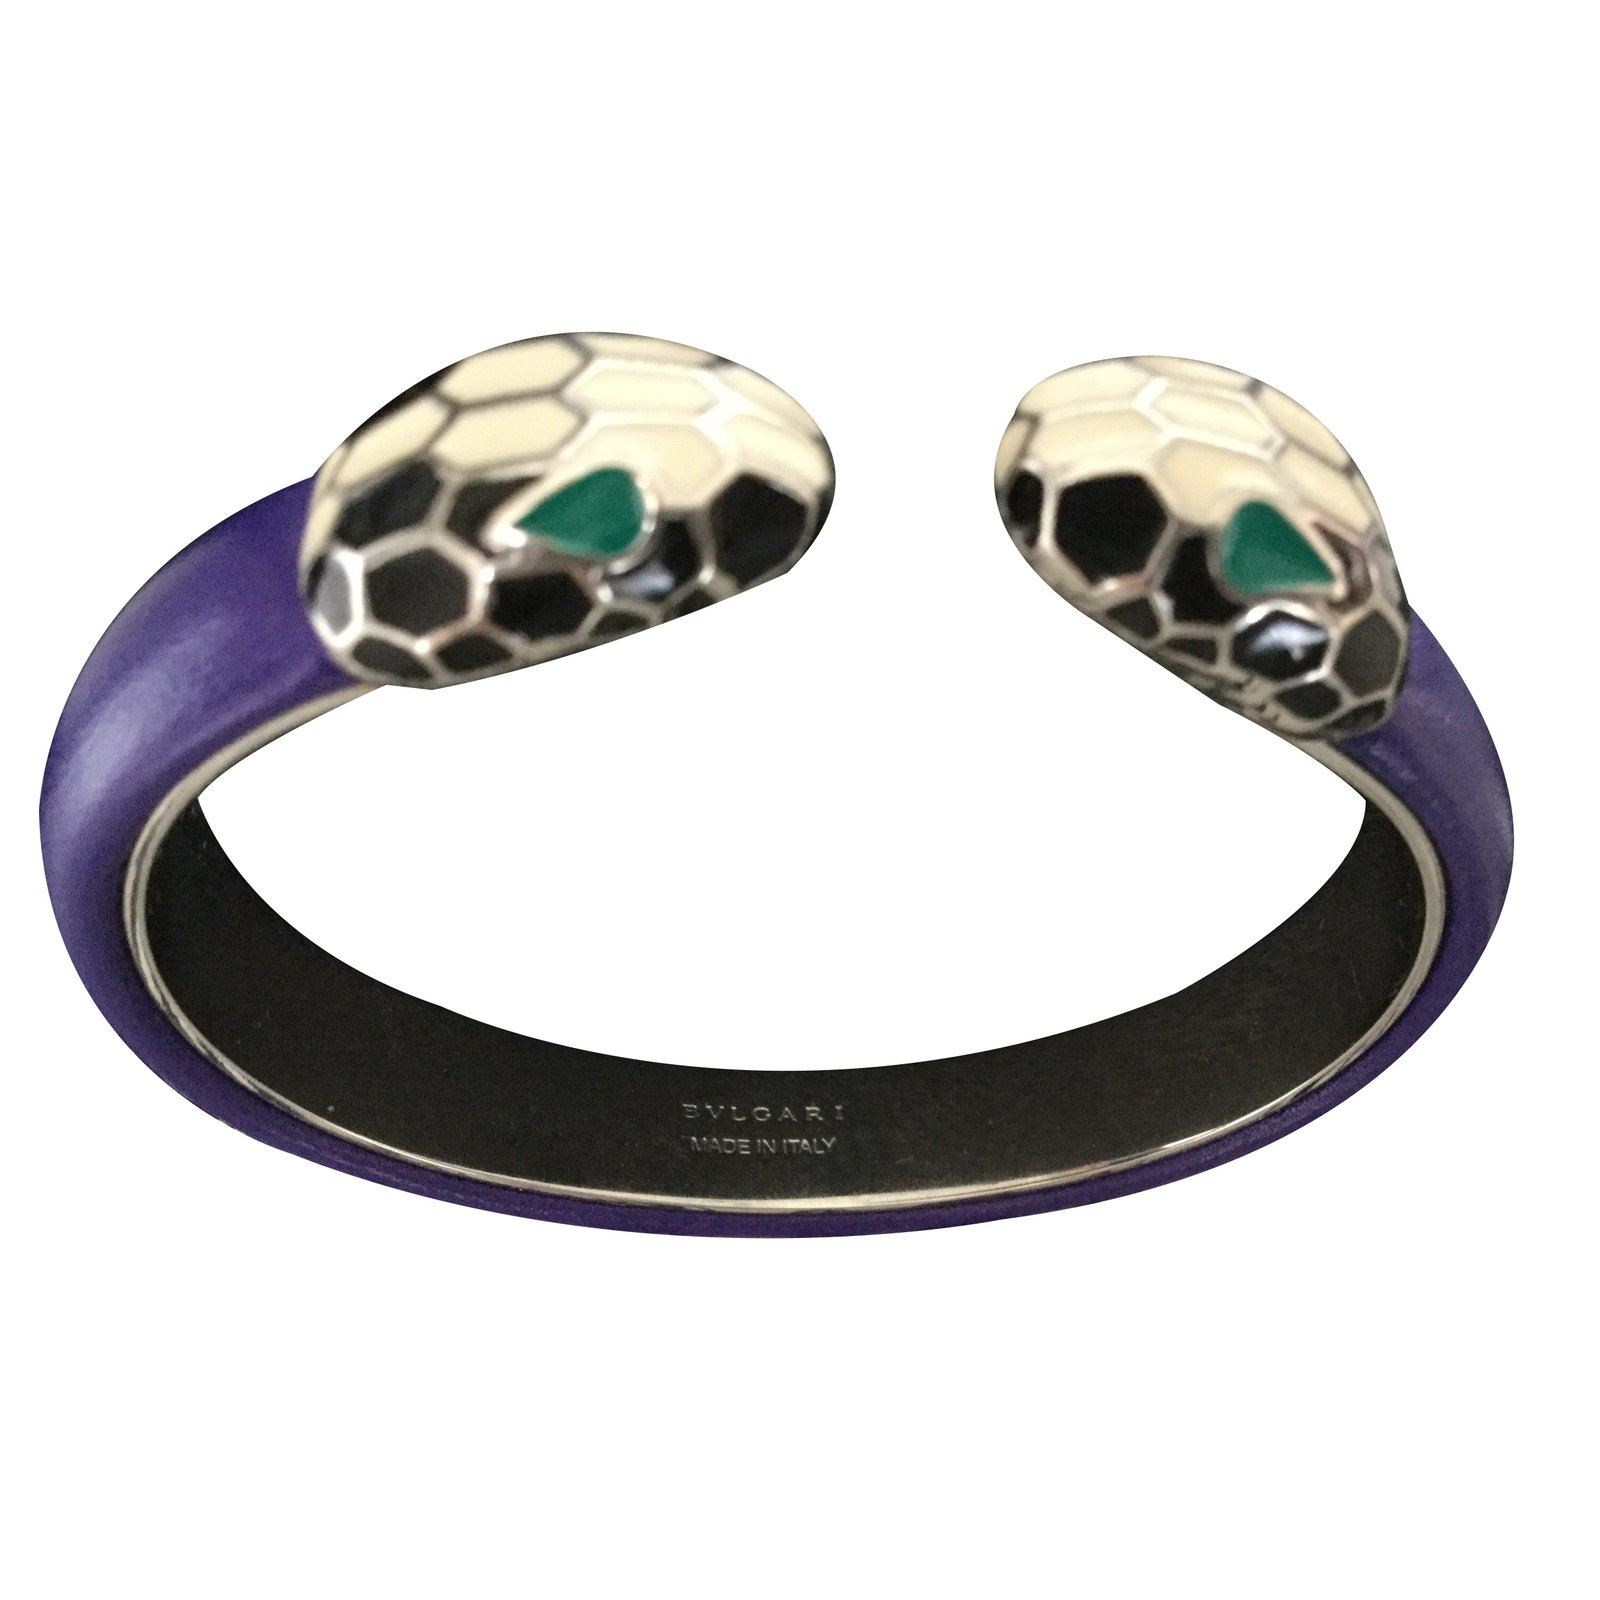 Bulgari Serpenti Bracelet Ring